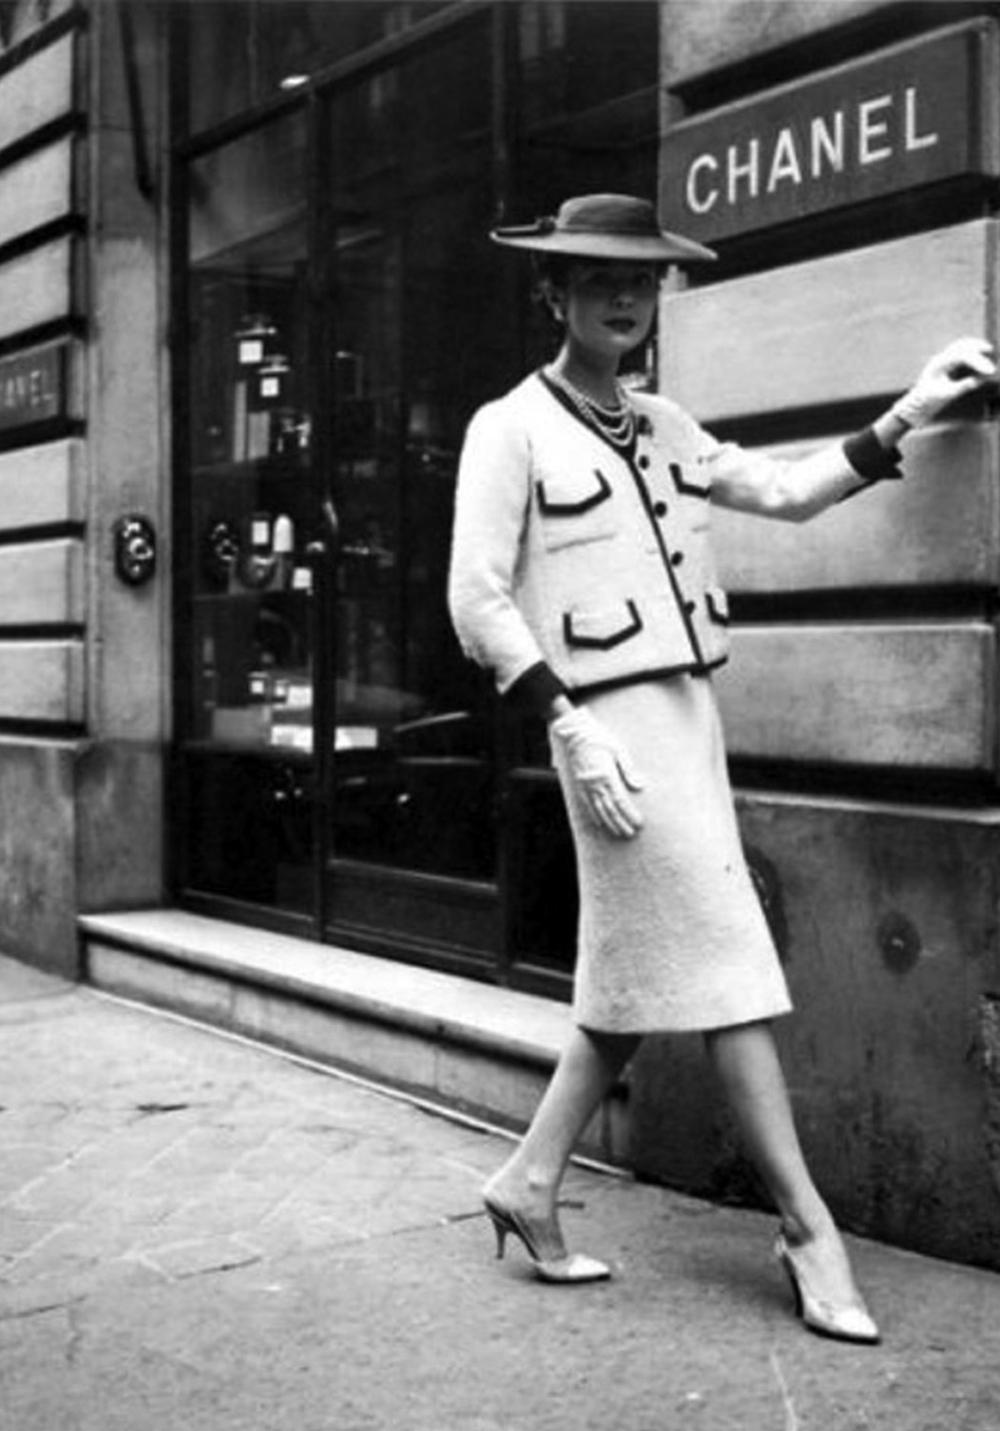 Chanel Suit.jpg